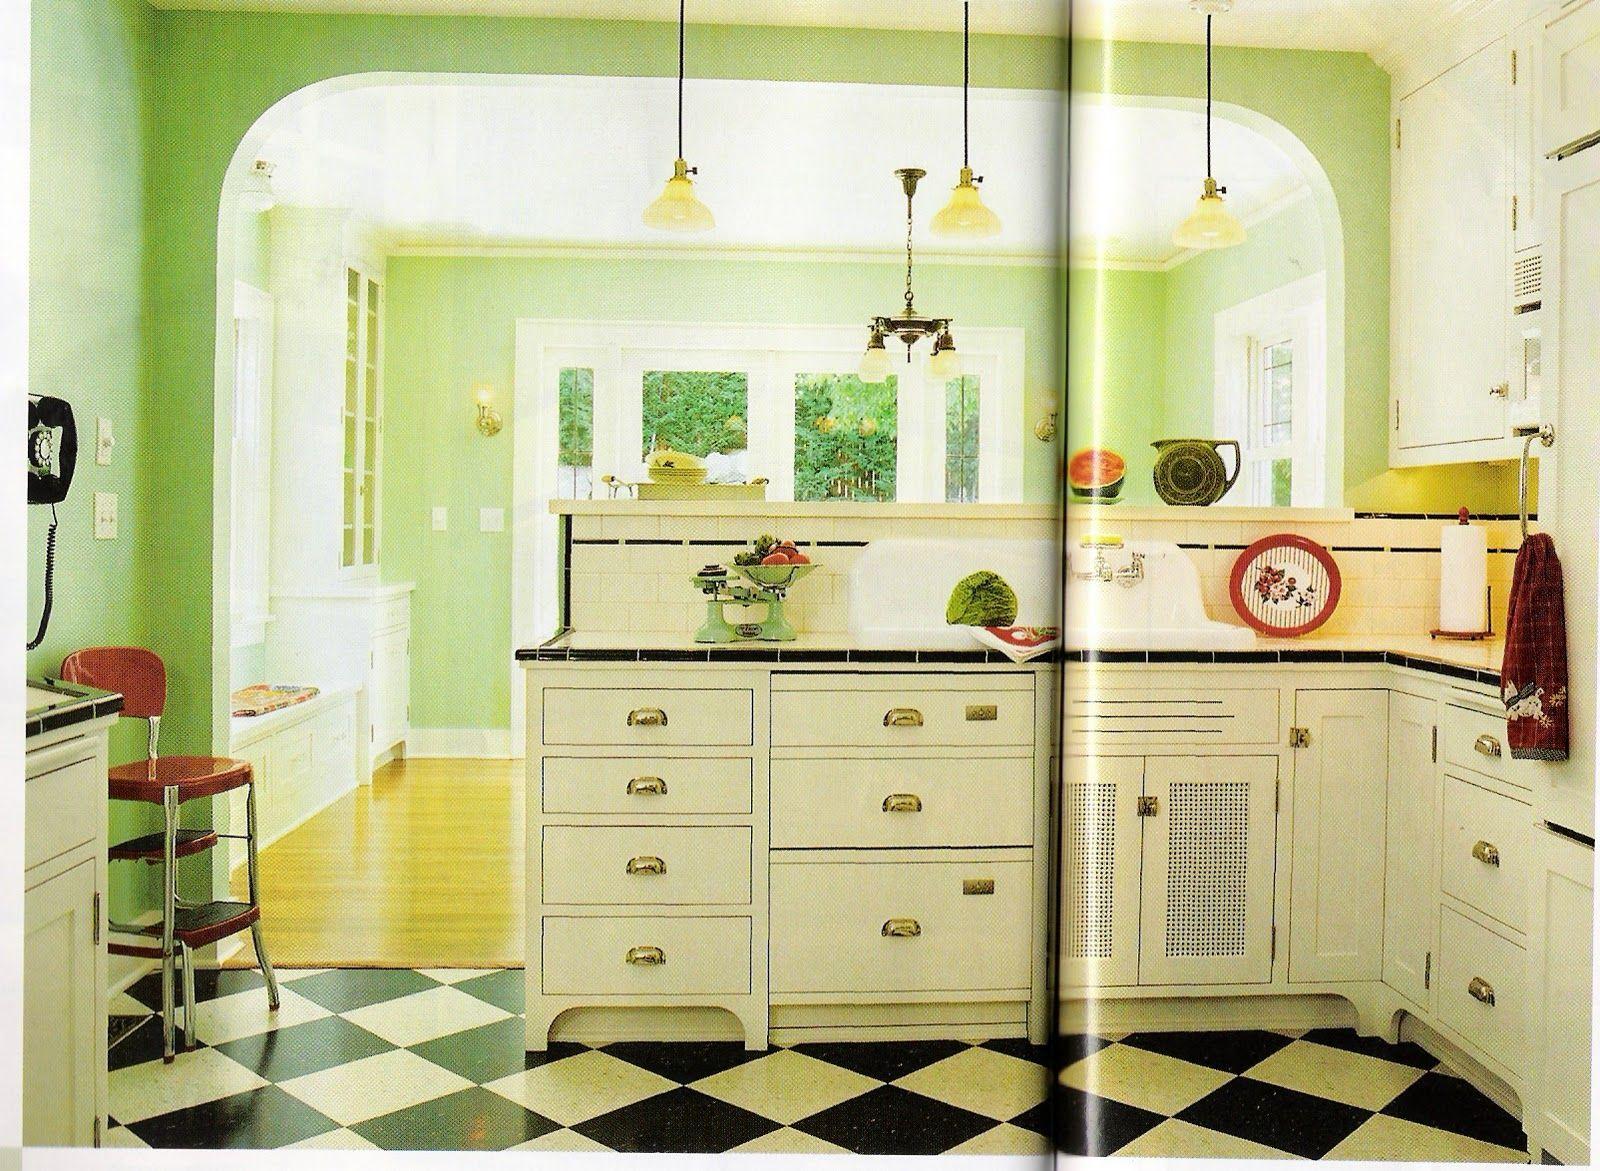 Interior Dazzling Vintage Decorating Ideas Delightful Retro Romantic Shabby Chic Dining Room